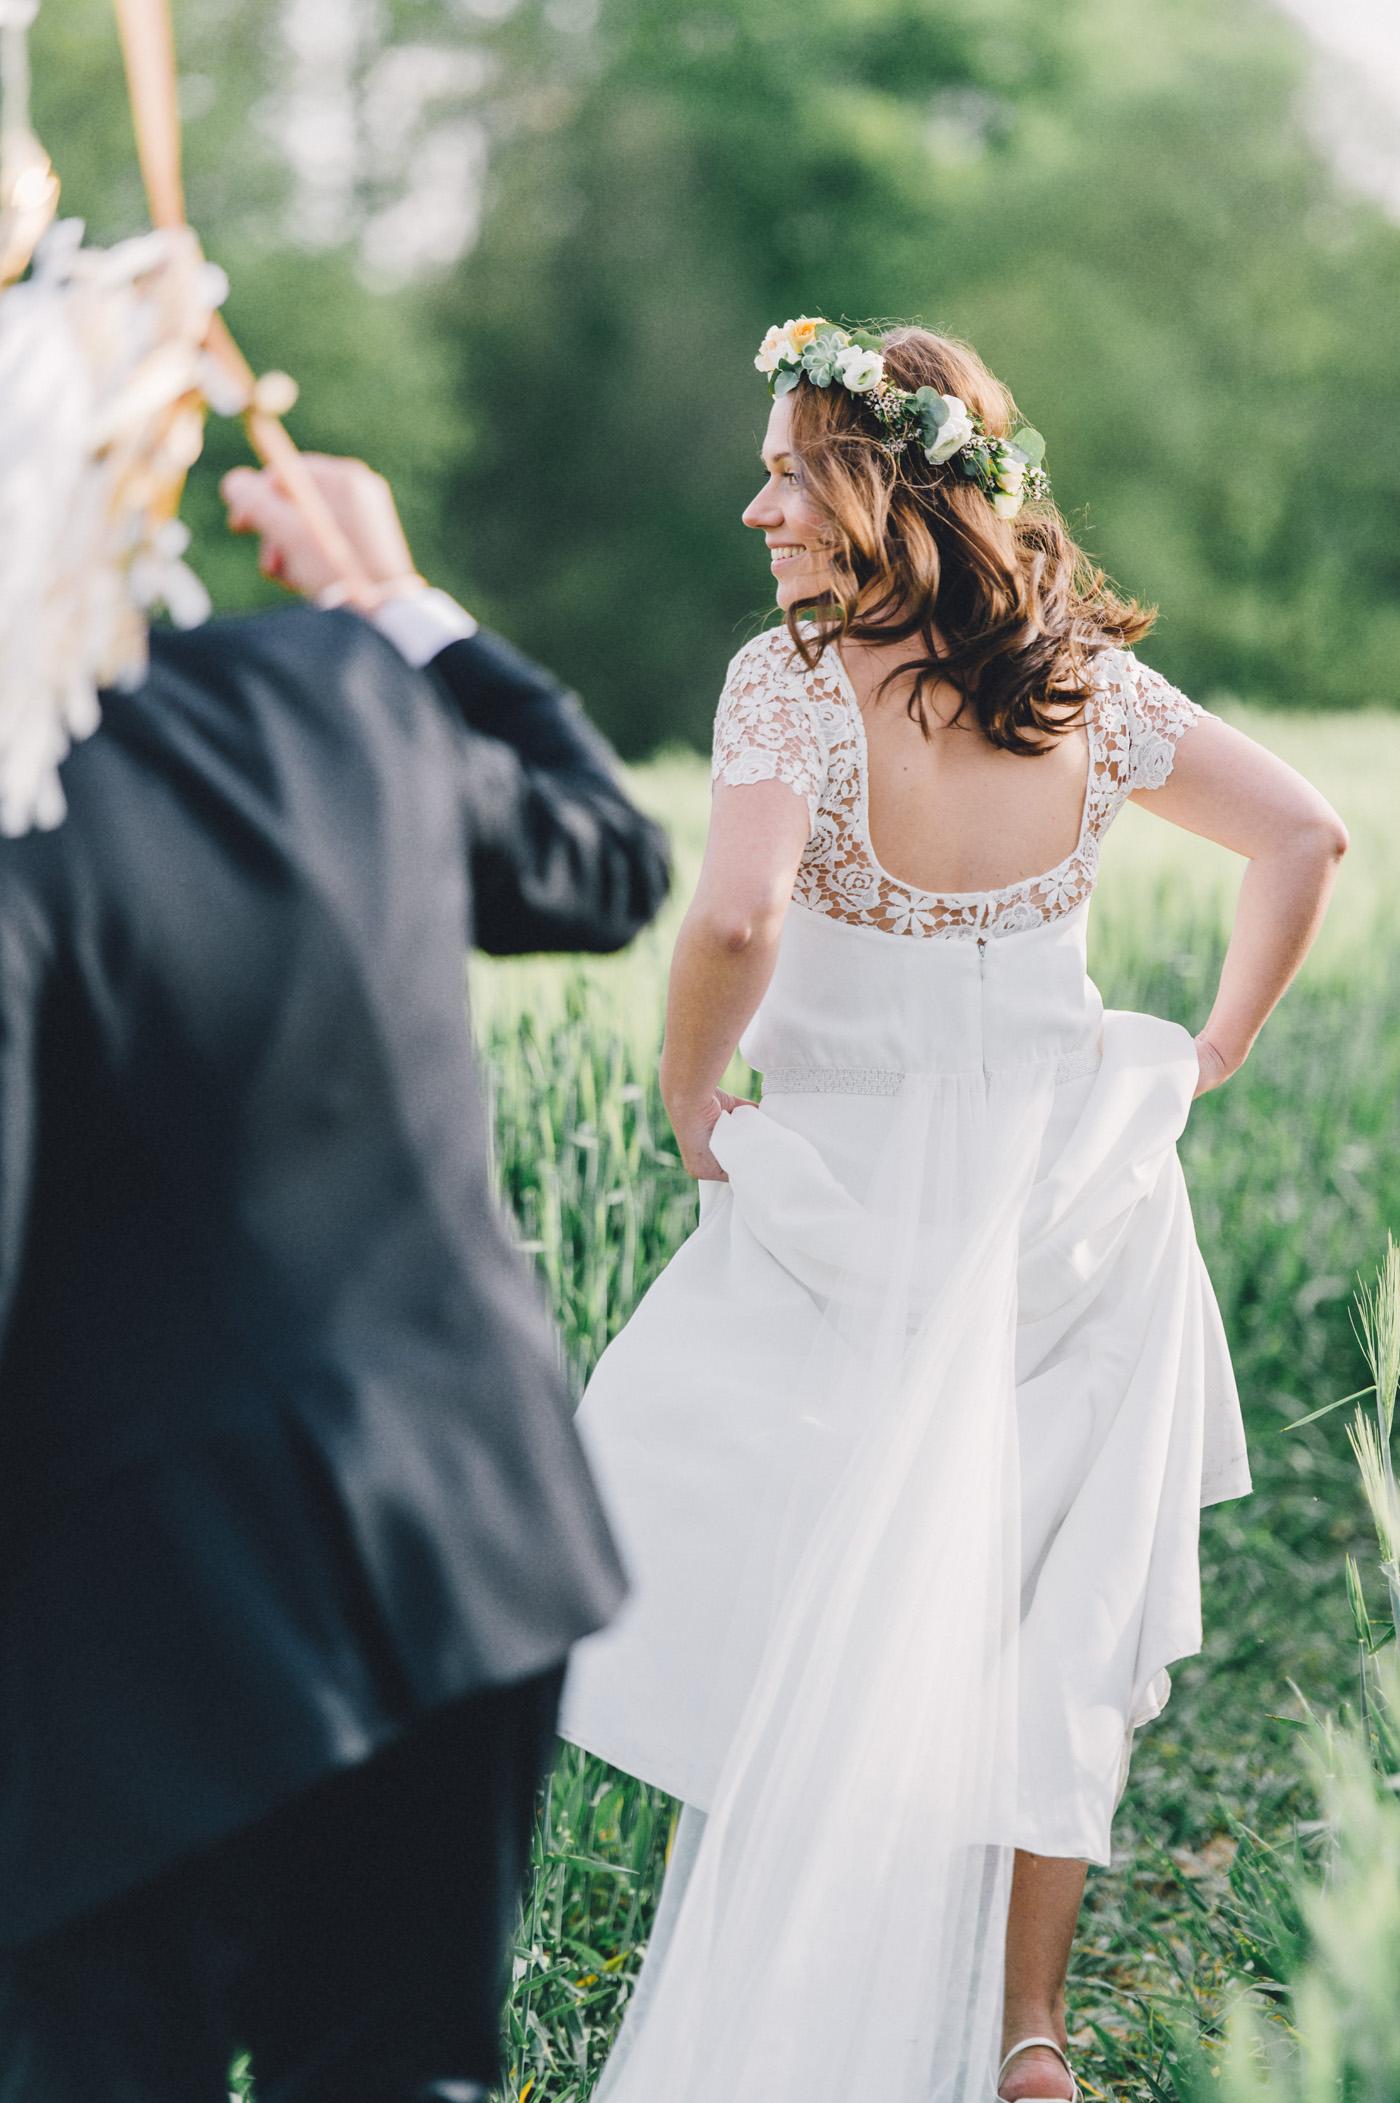 diy-wedding-nothenhof-hoch-9